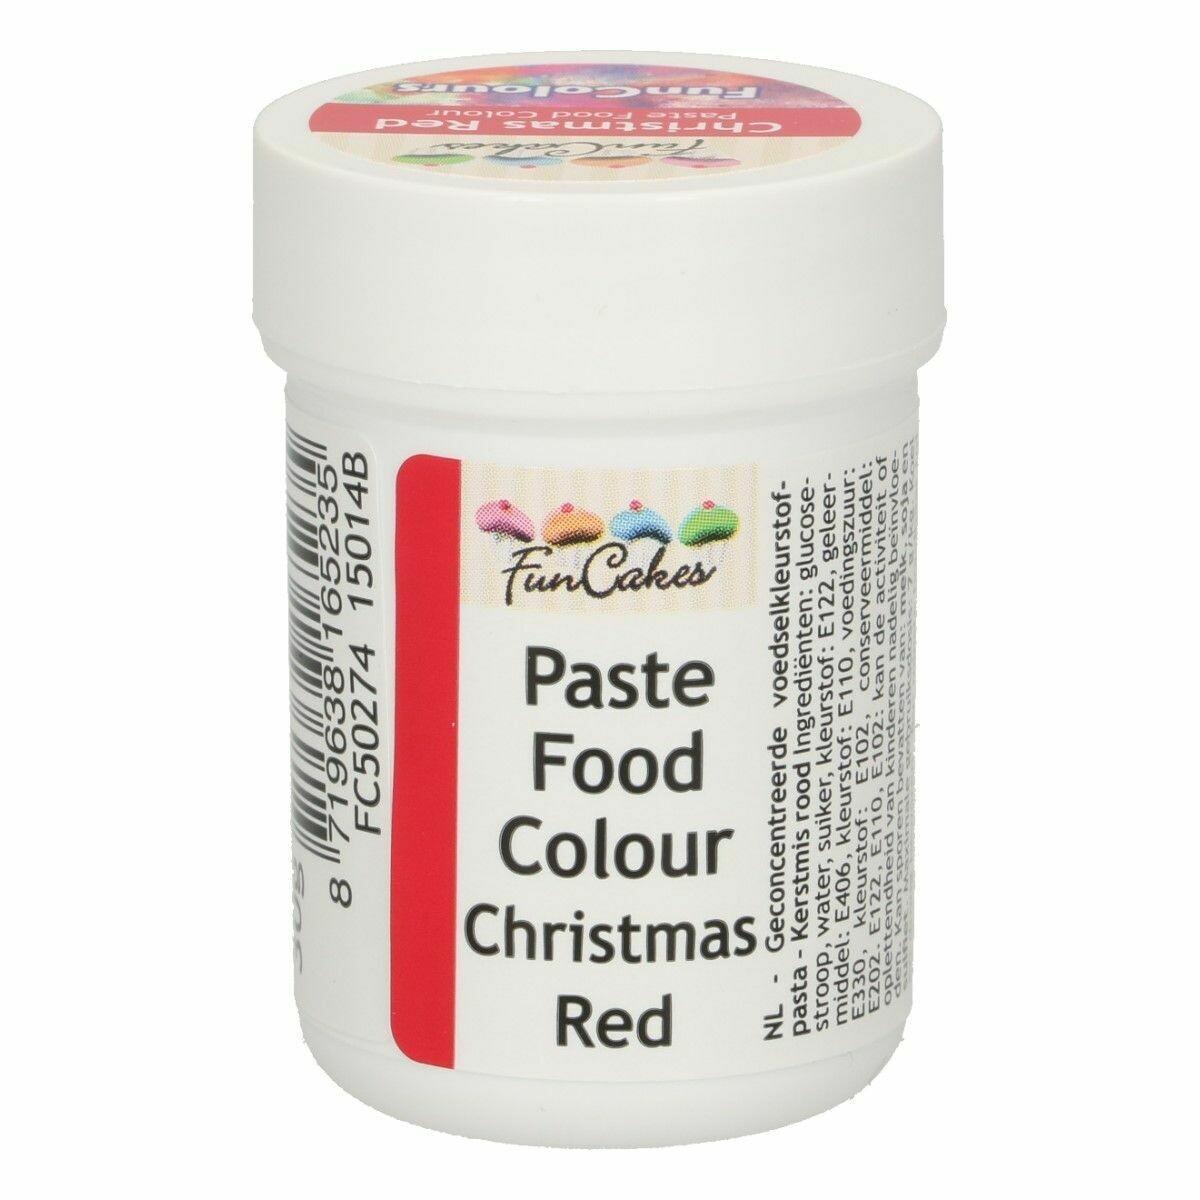 FunCakes FunColours PASTE - CHRISTMAS RED - Χρώμα σε Πάστα - Κόκκινο Χριστουγέννων  30γρ